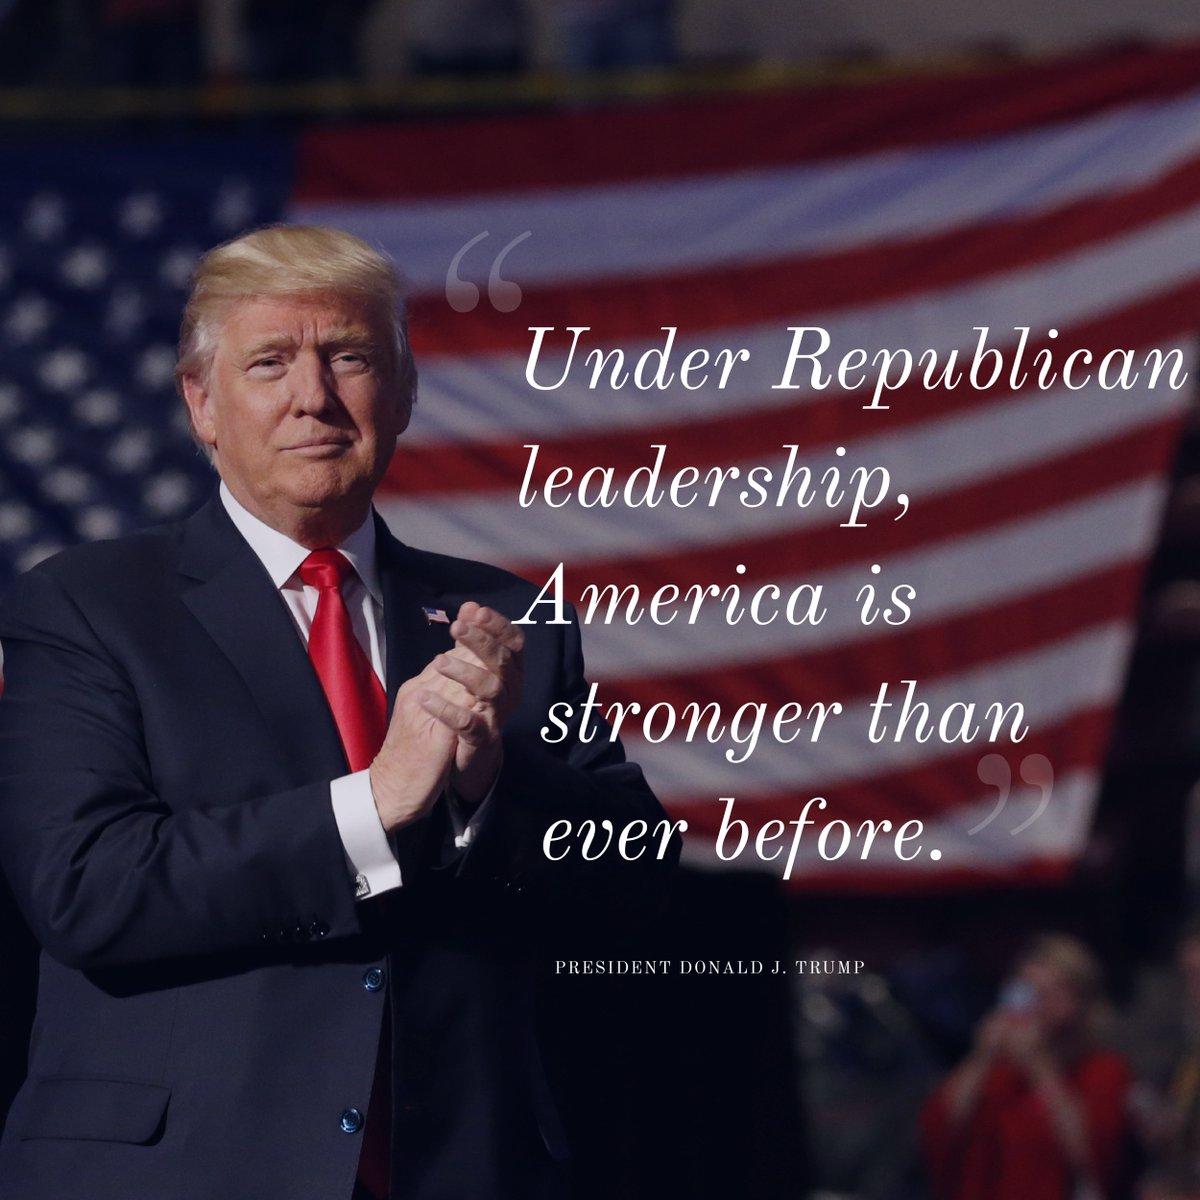 THANK YOU, @realDonaldTrump!